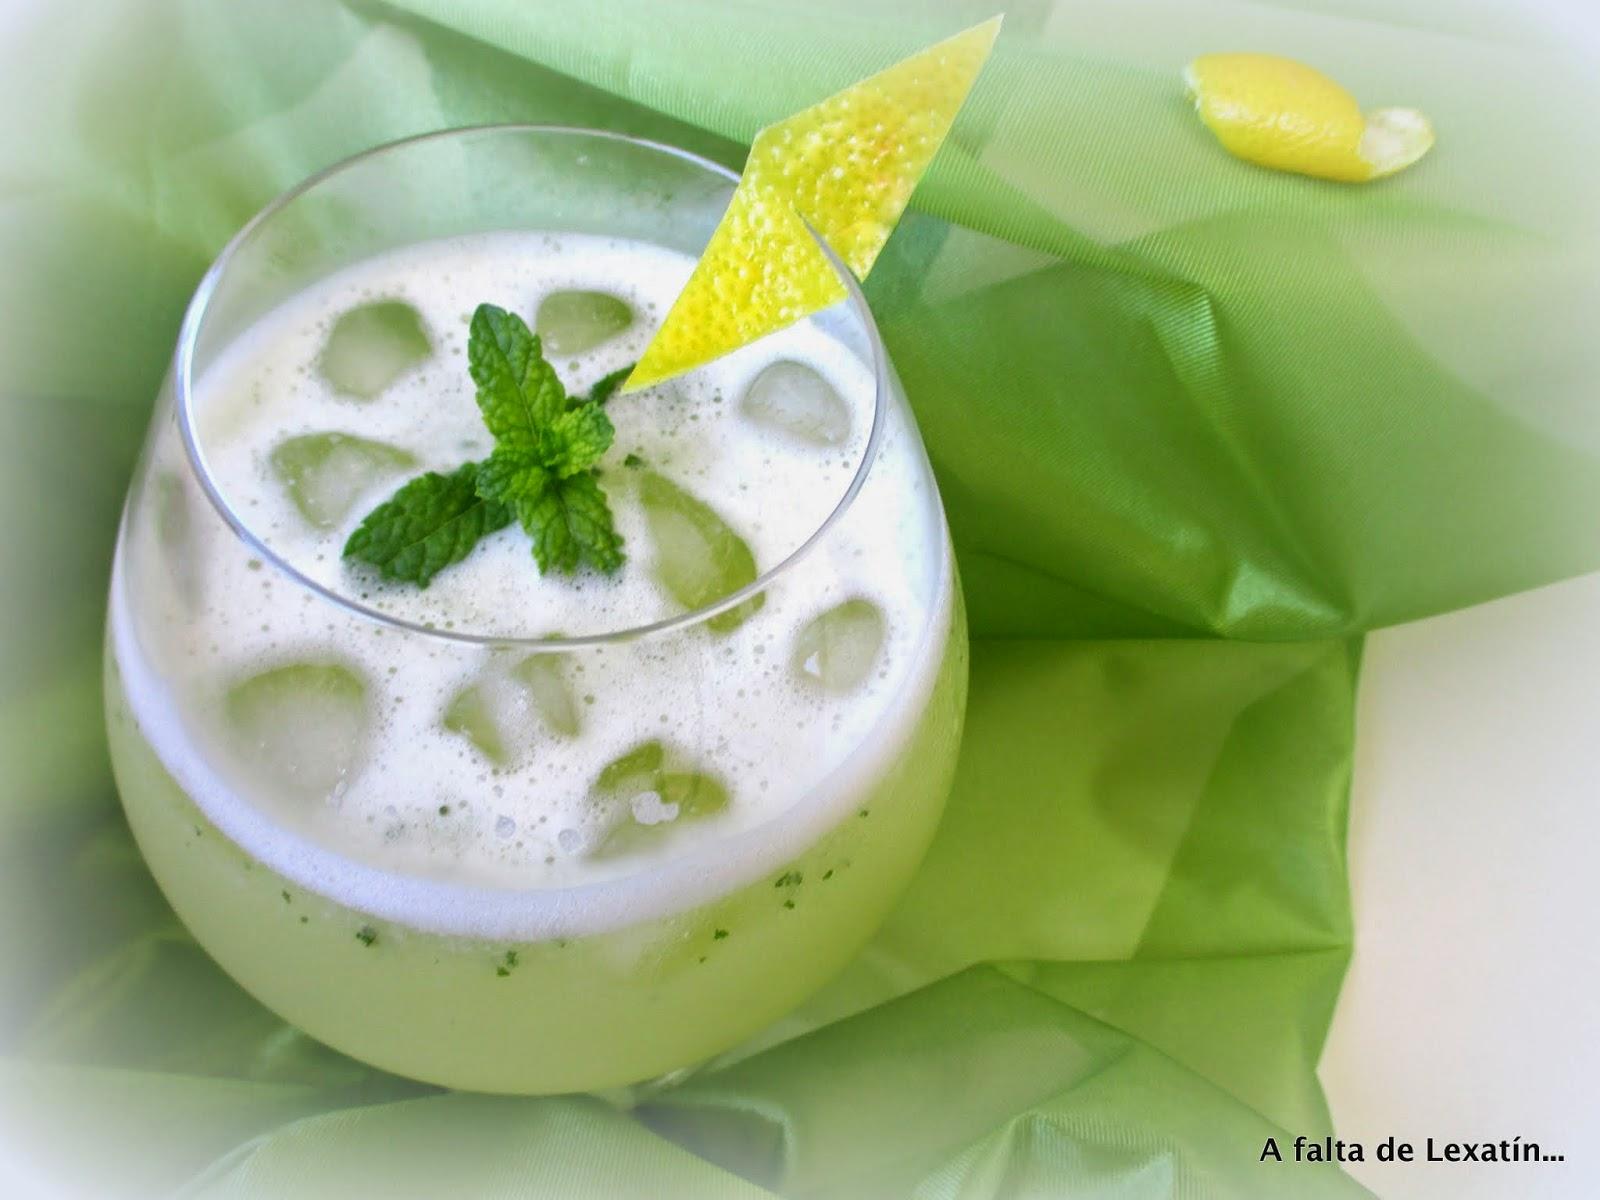 Limonada con menta // Lemon and mint juice